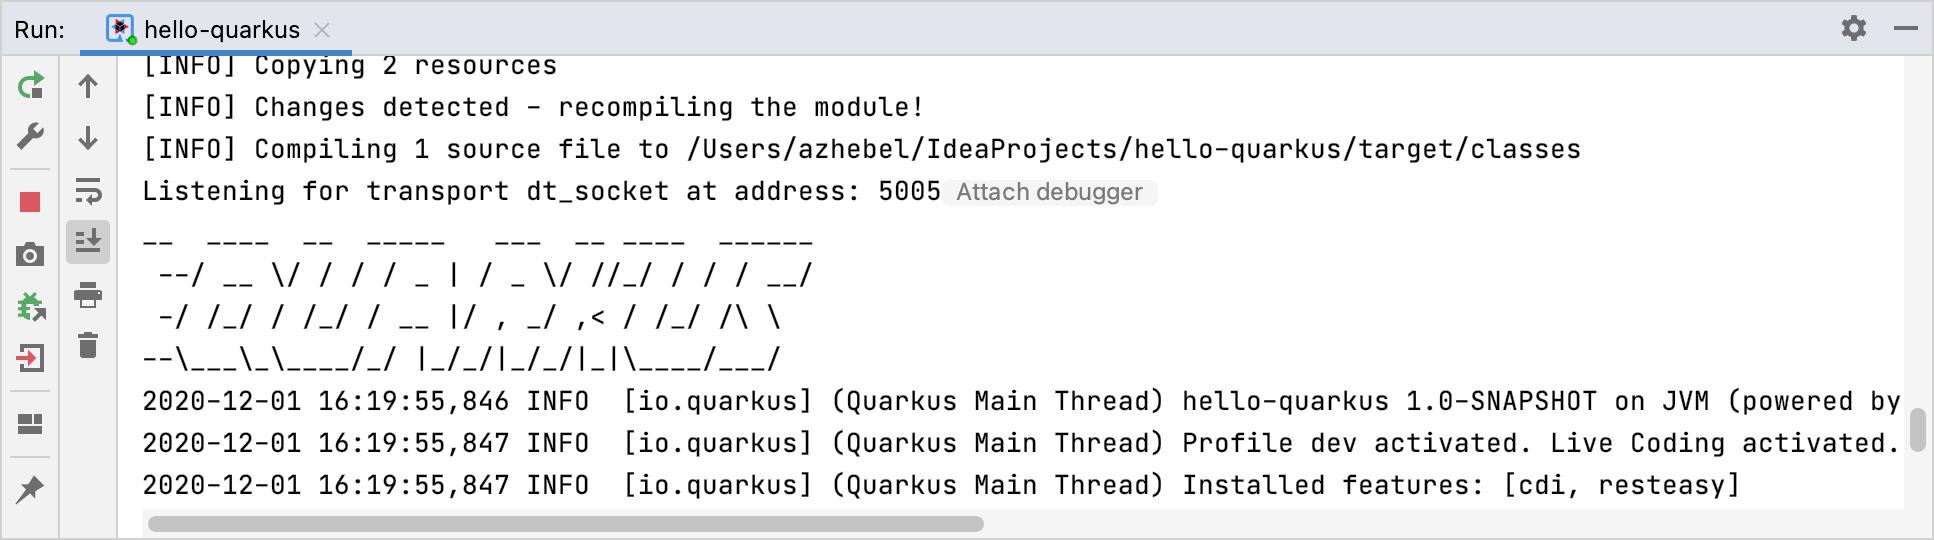 Quarkus application running in the Run tool window